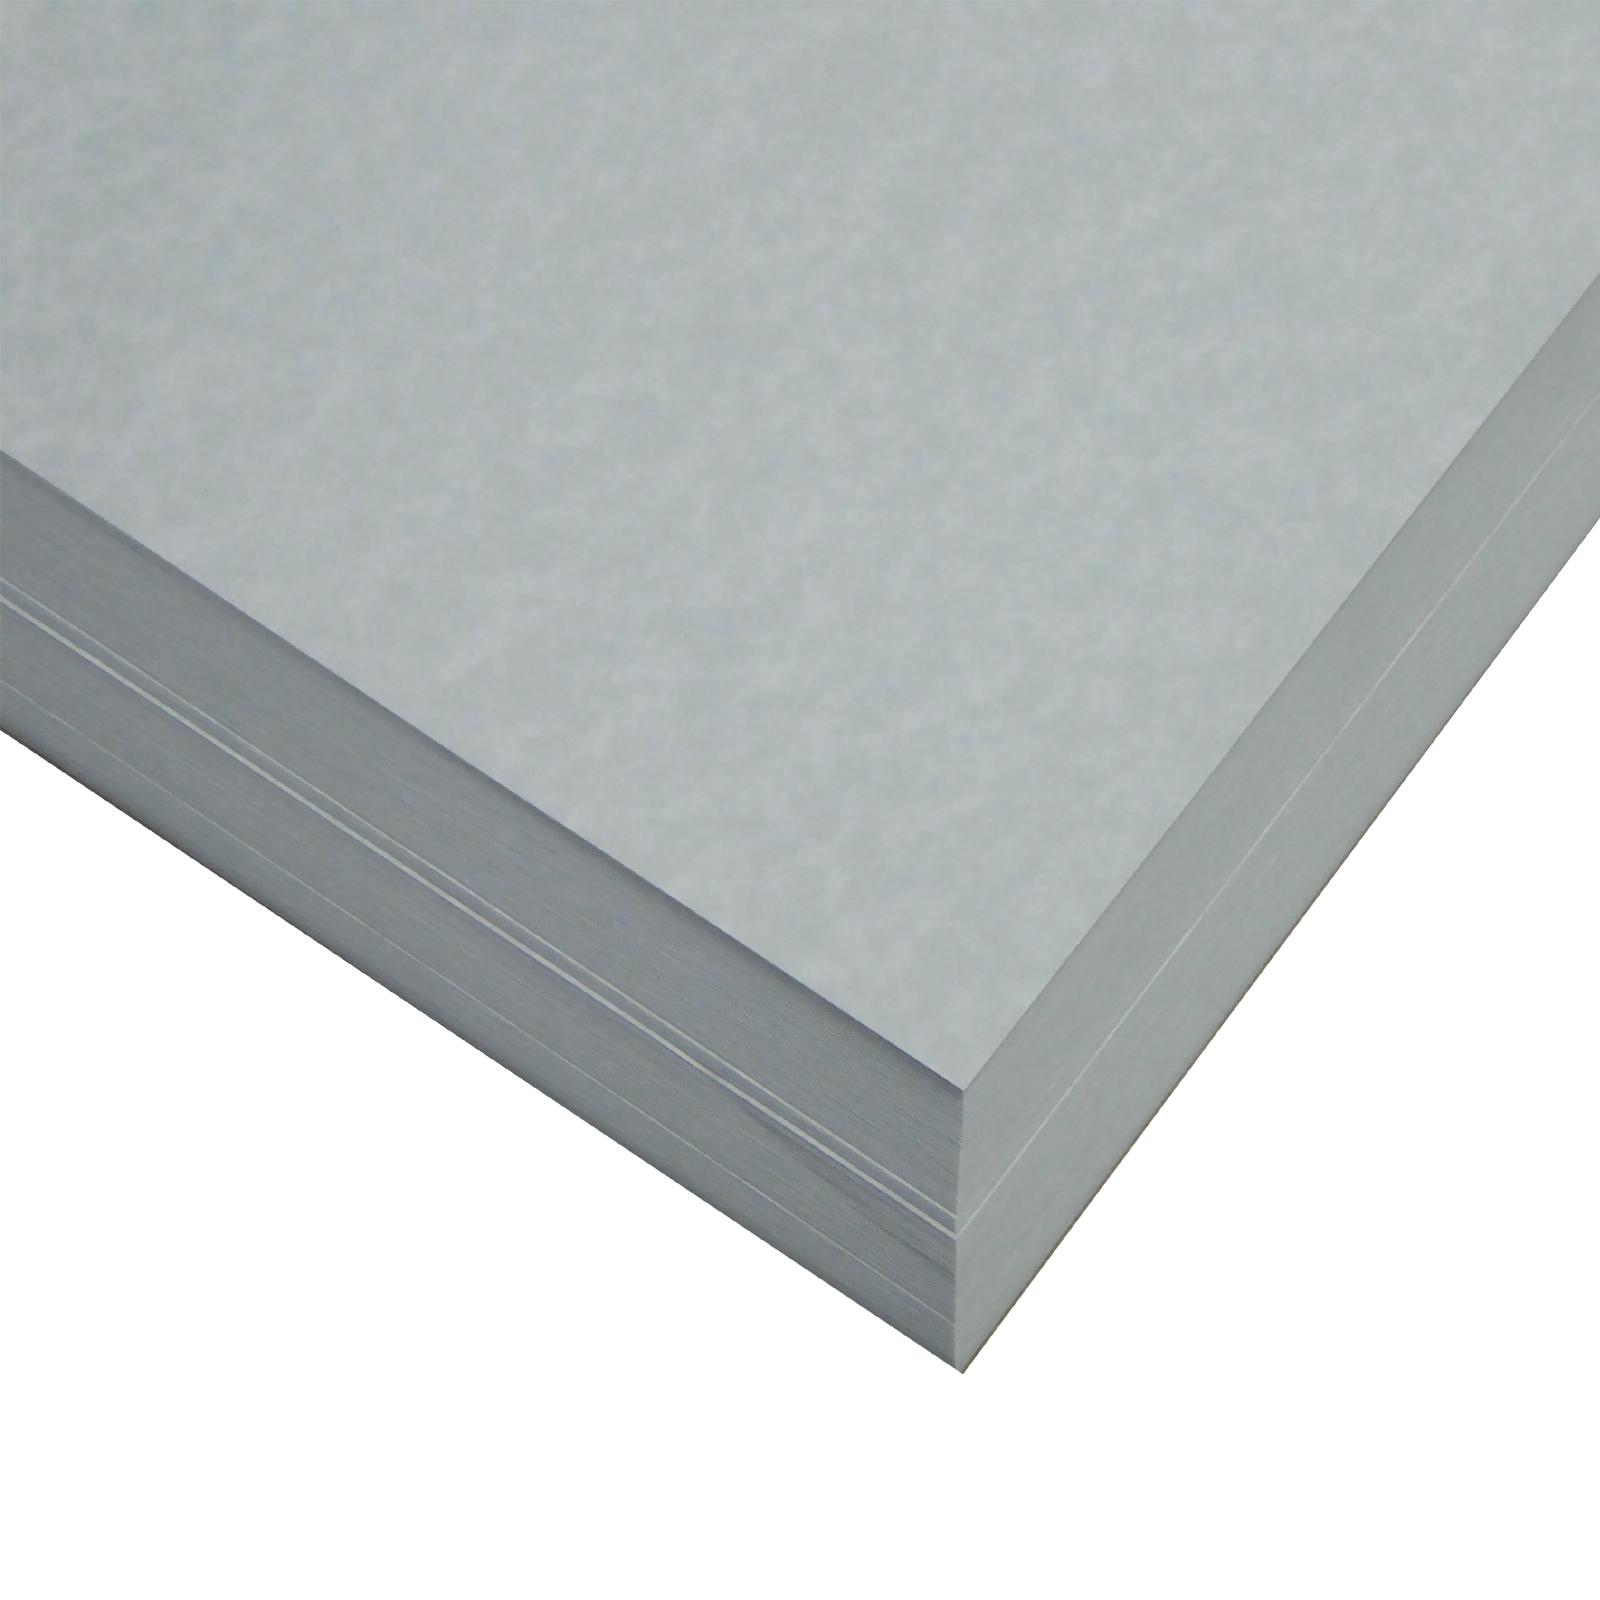 25//50 sheets Conqueror Light Blue Laid A4 250gsm Card